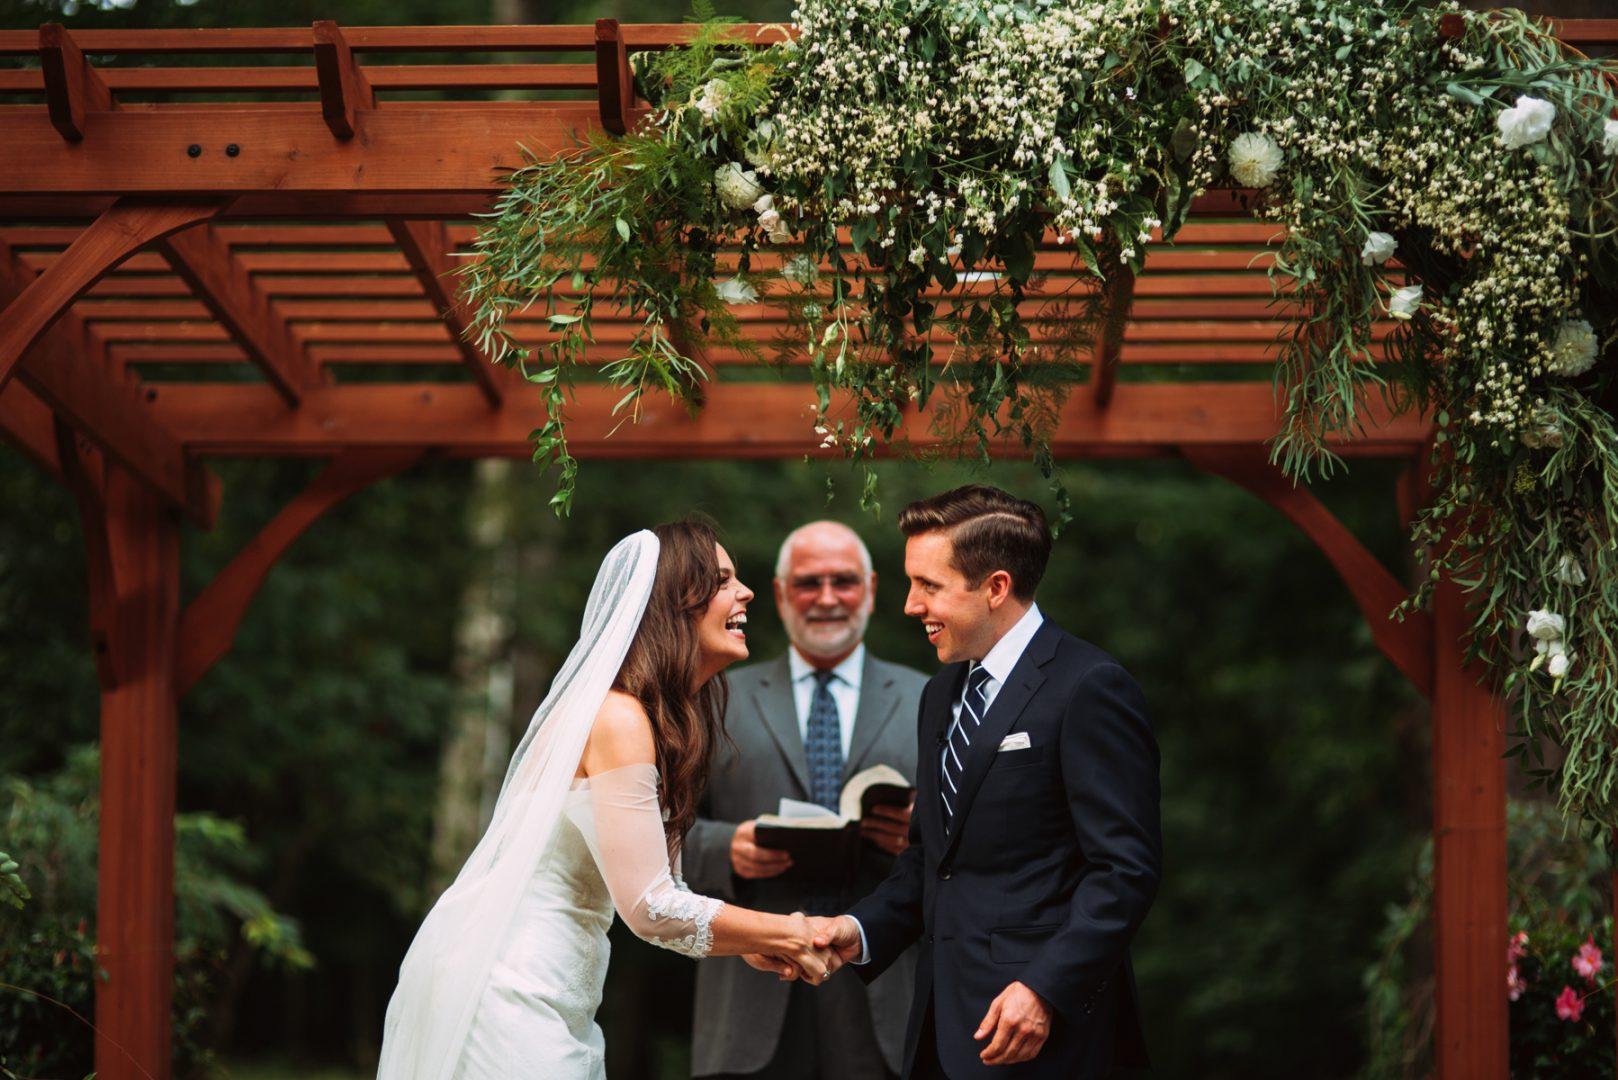 Robin Hill outdoor wedding